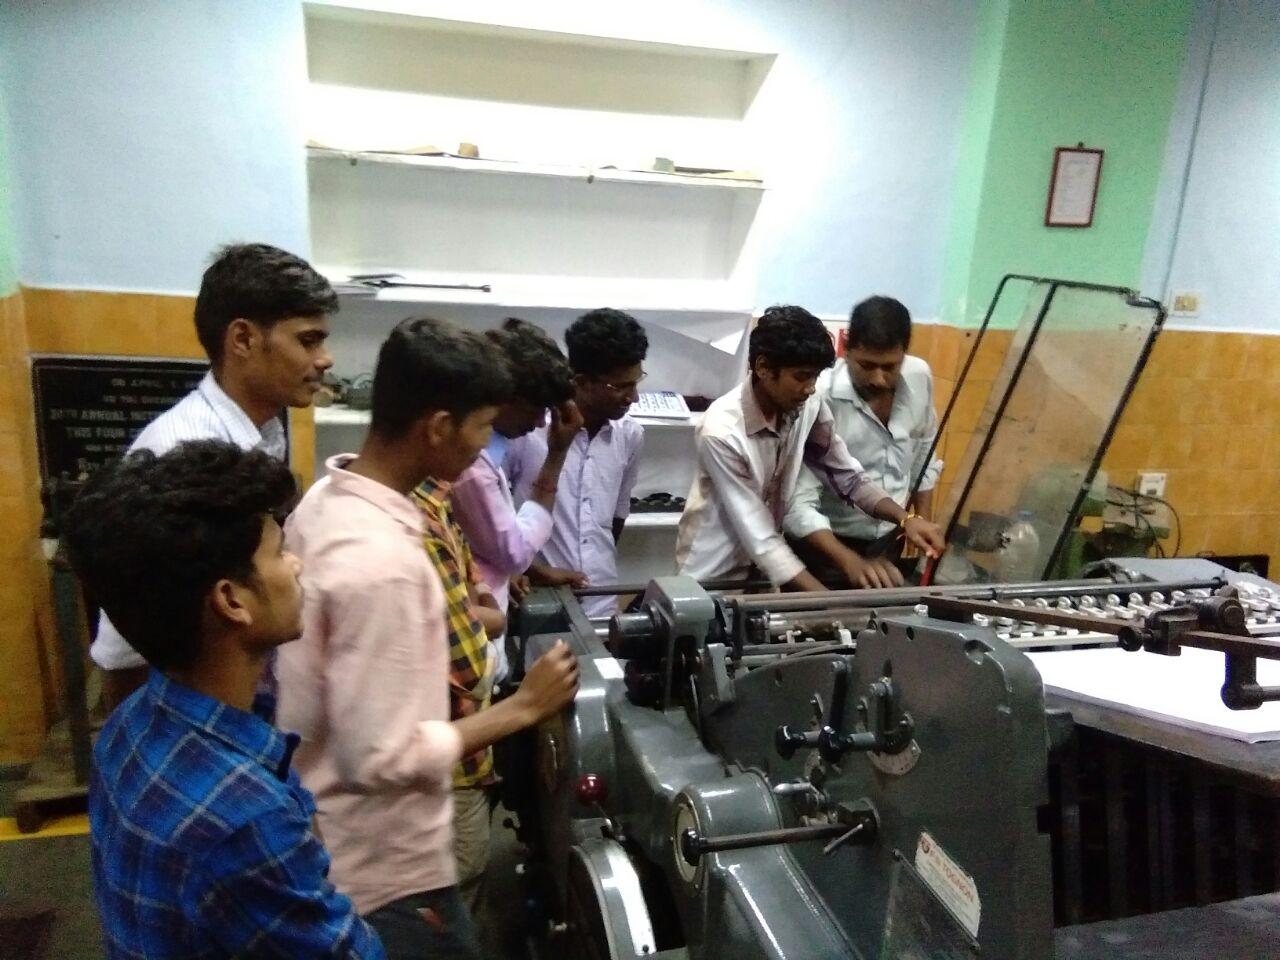 Stallion Printing Press, UAE (Sharjah) – Salesian Institute of